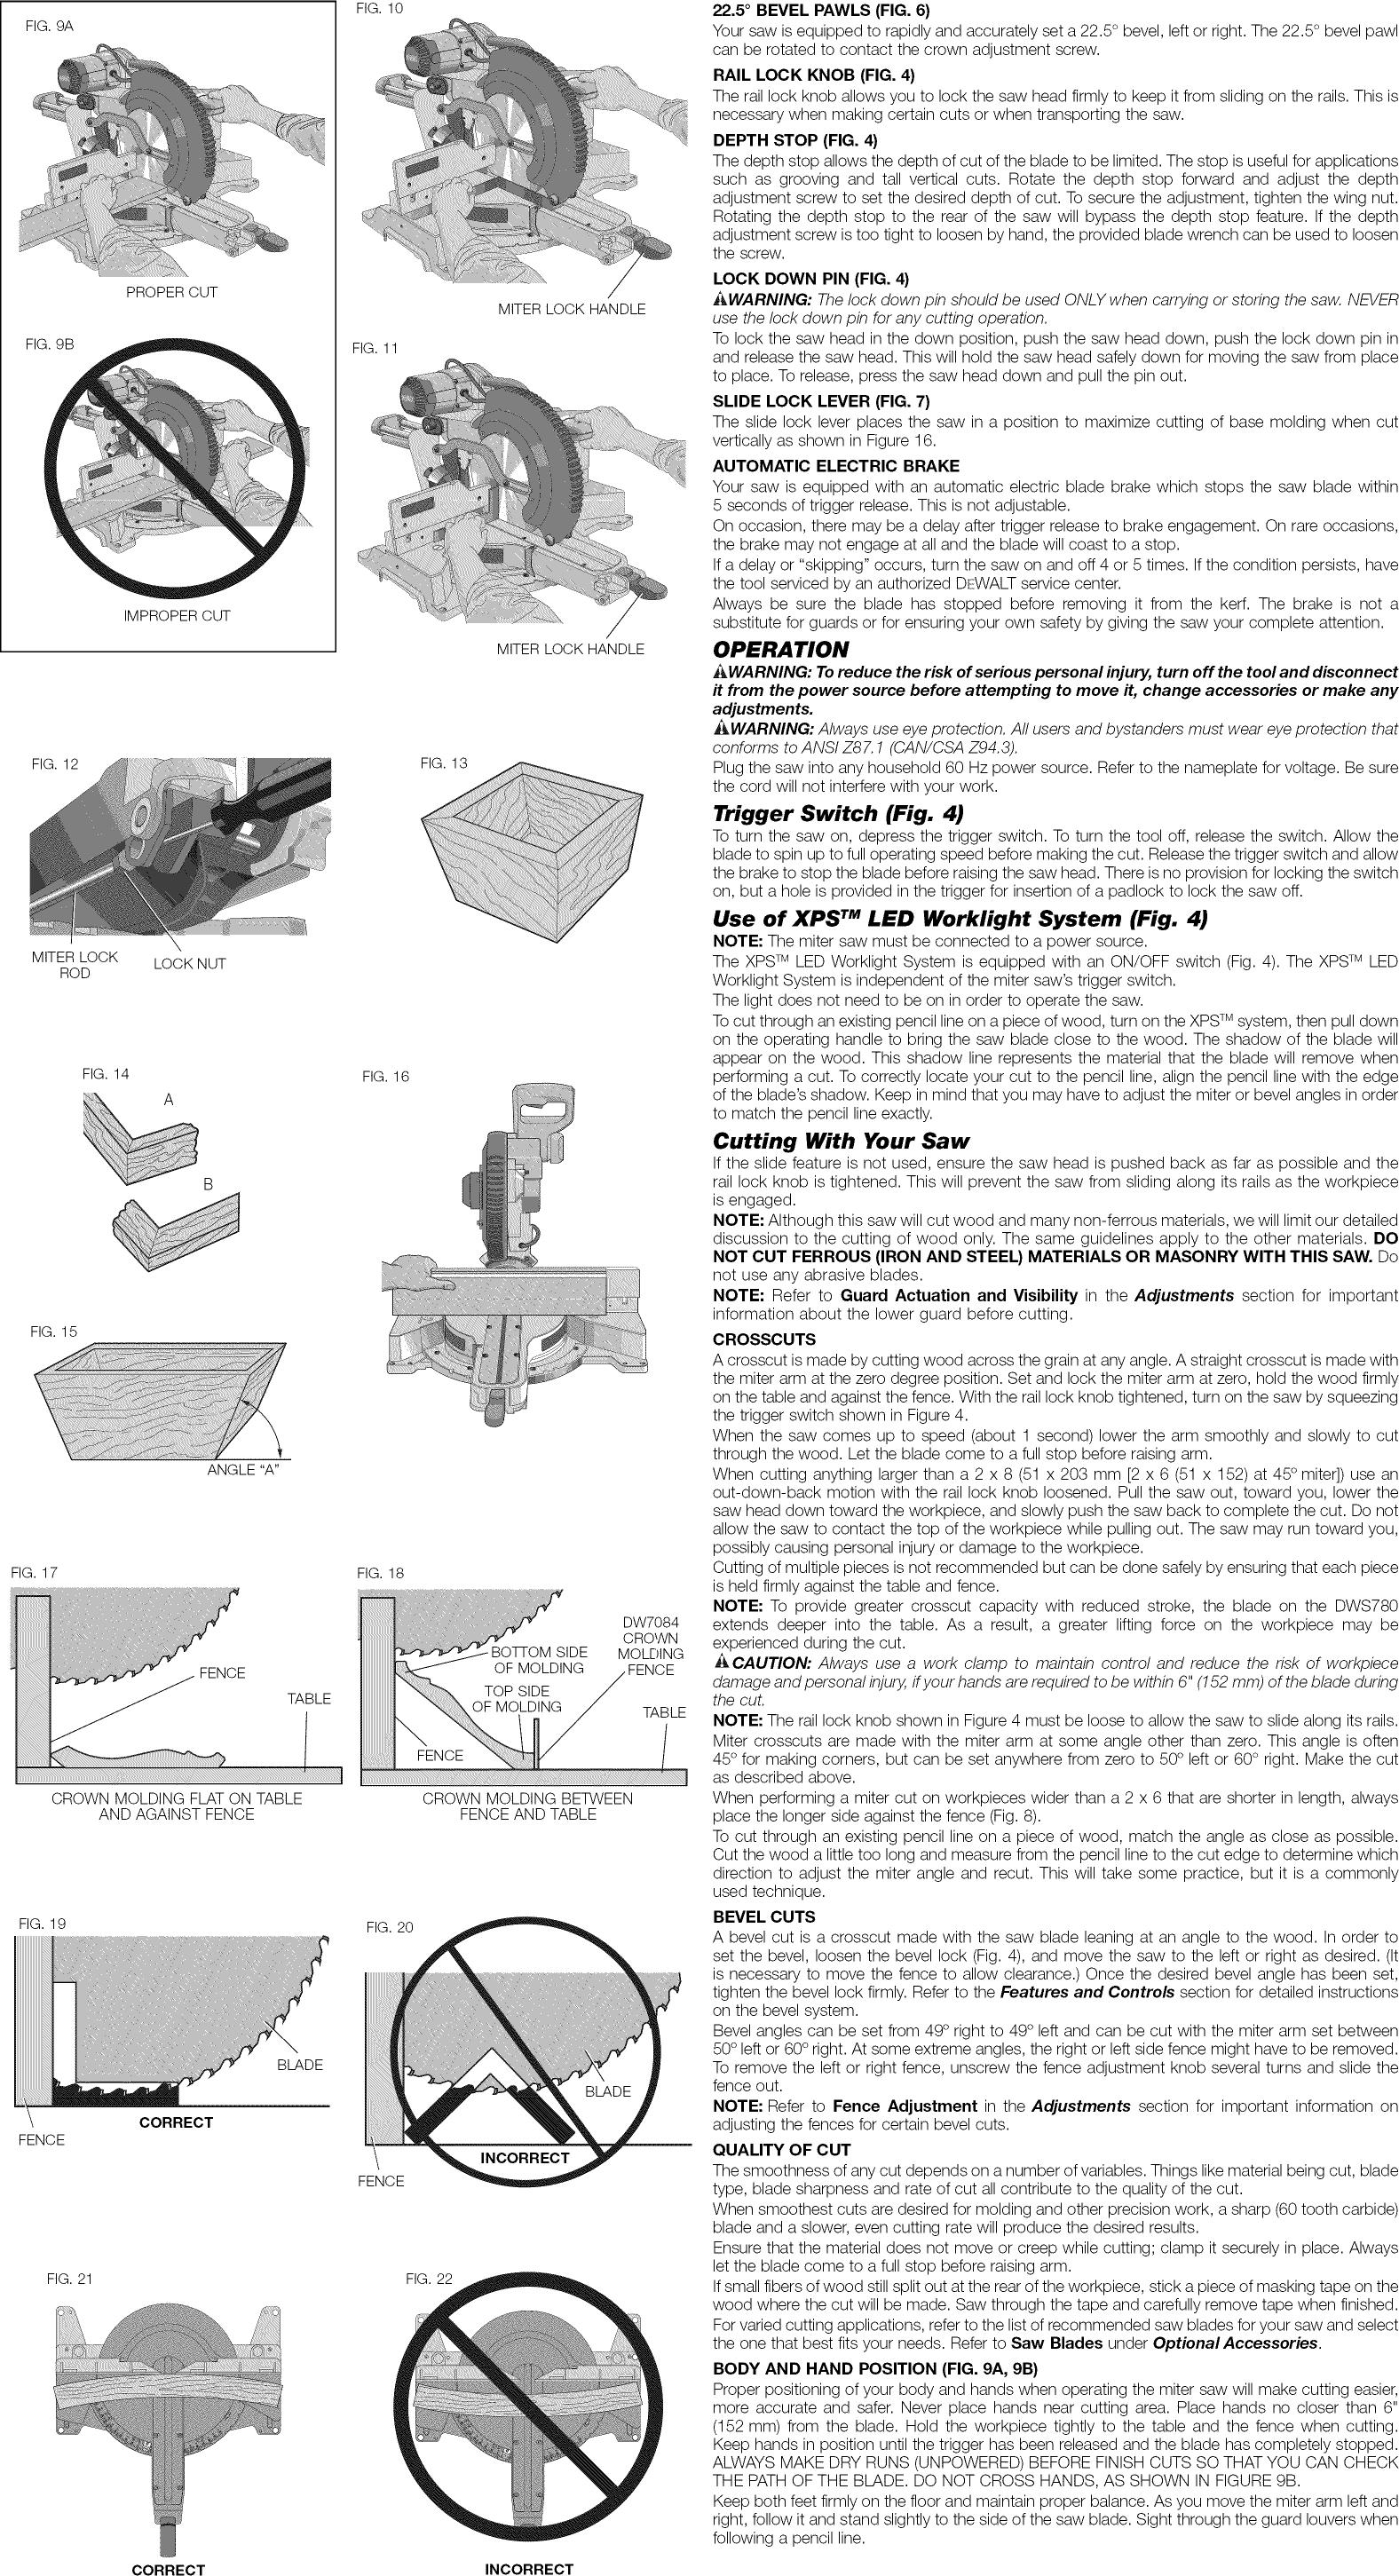 Dewalt 12 Miter Saw Dws 780 Owners Manual Manual Guide